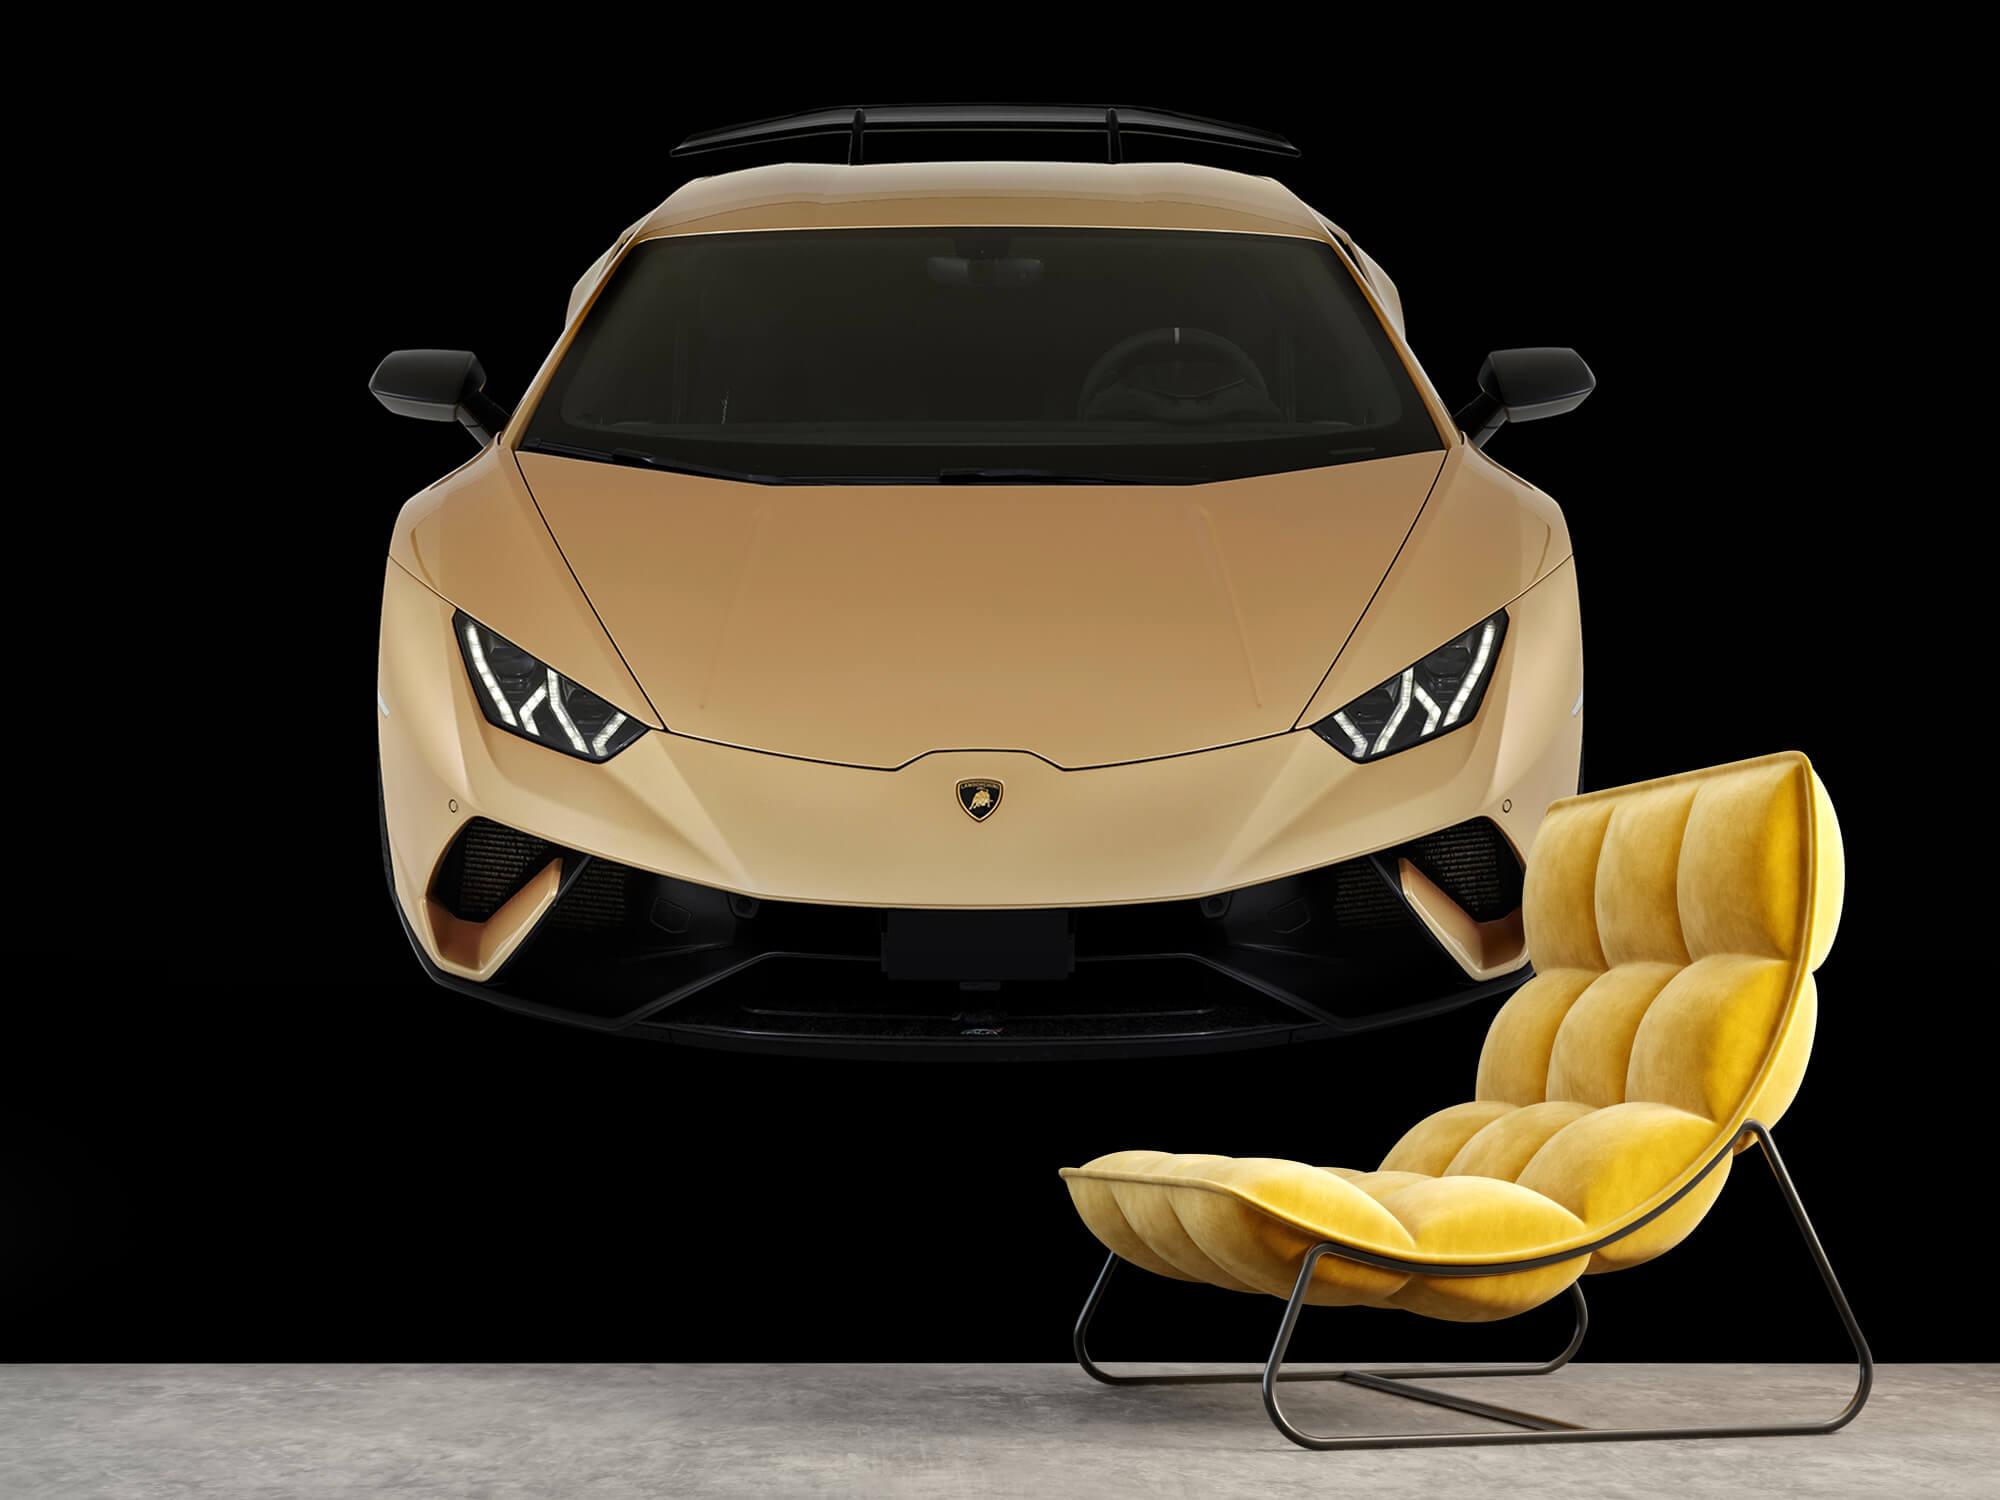 Wallpaper Lamborghini Huracán - Front from above, black 8